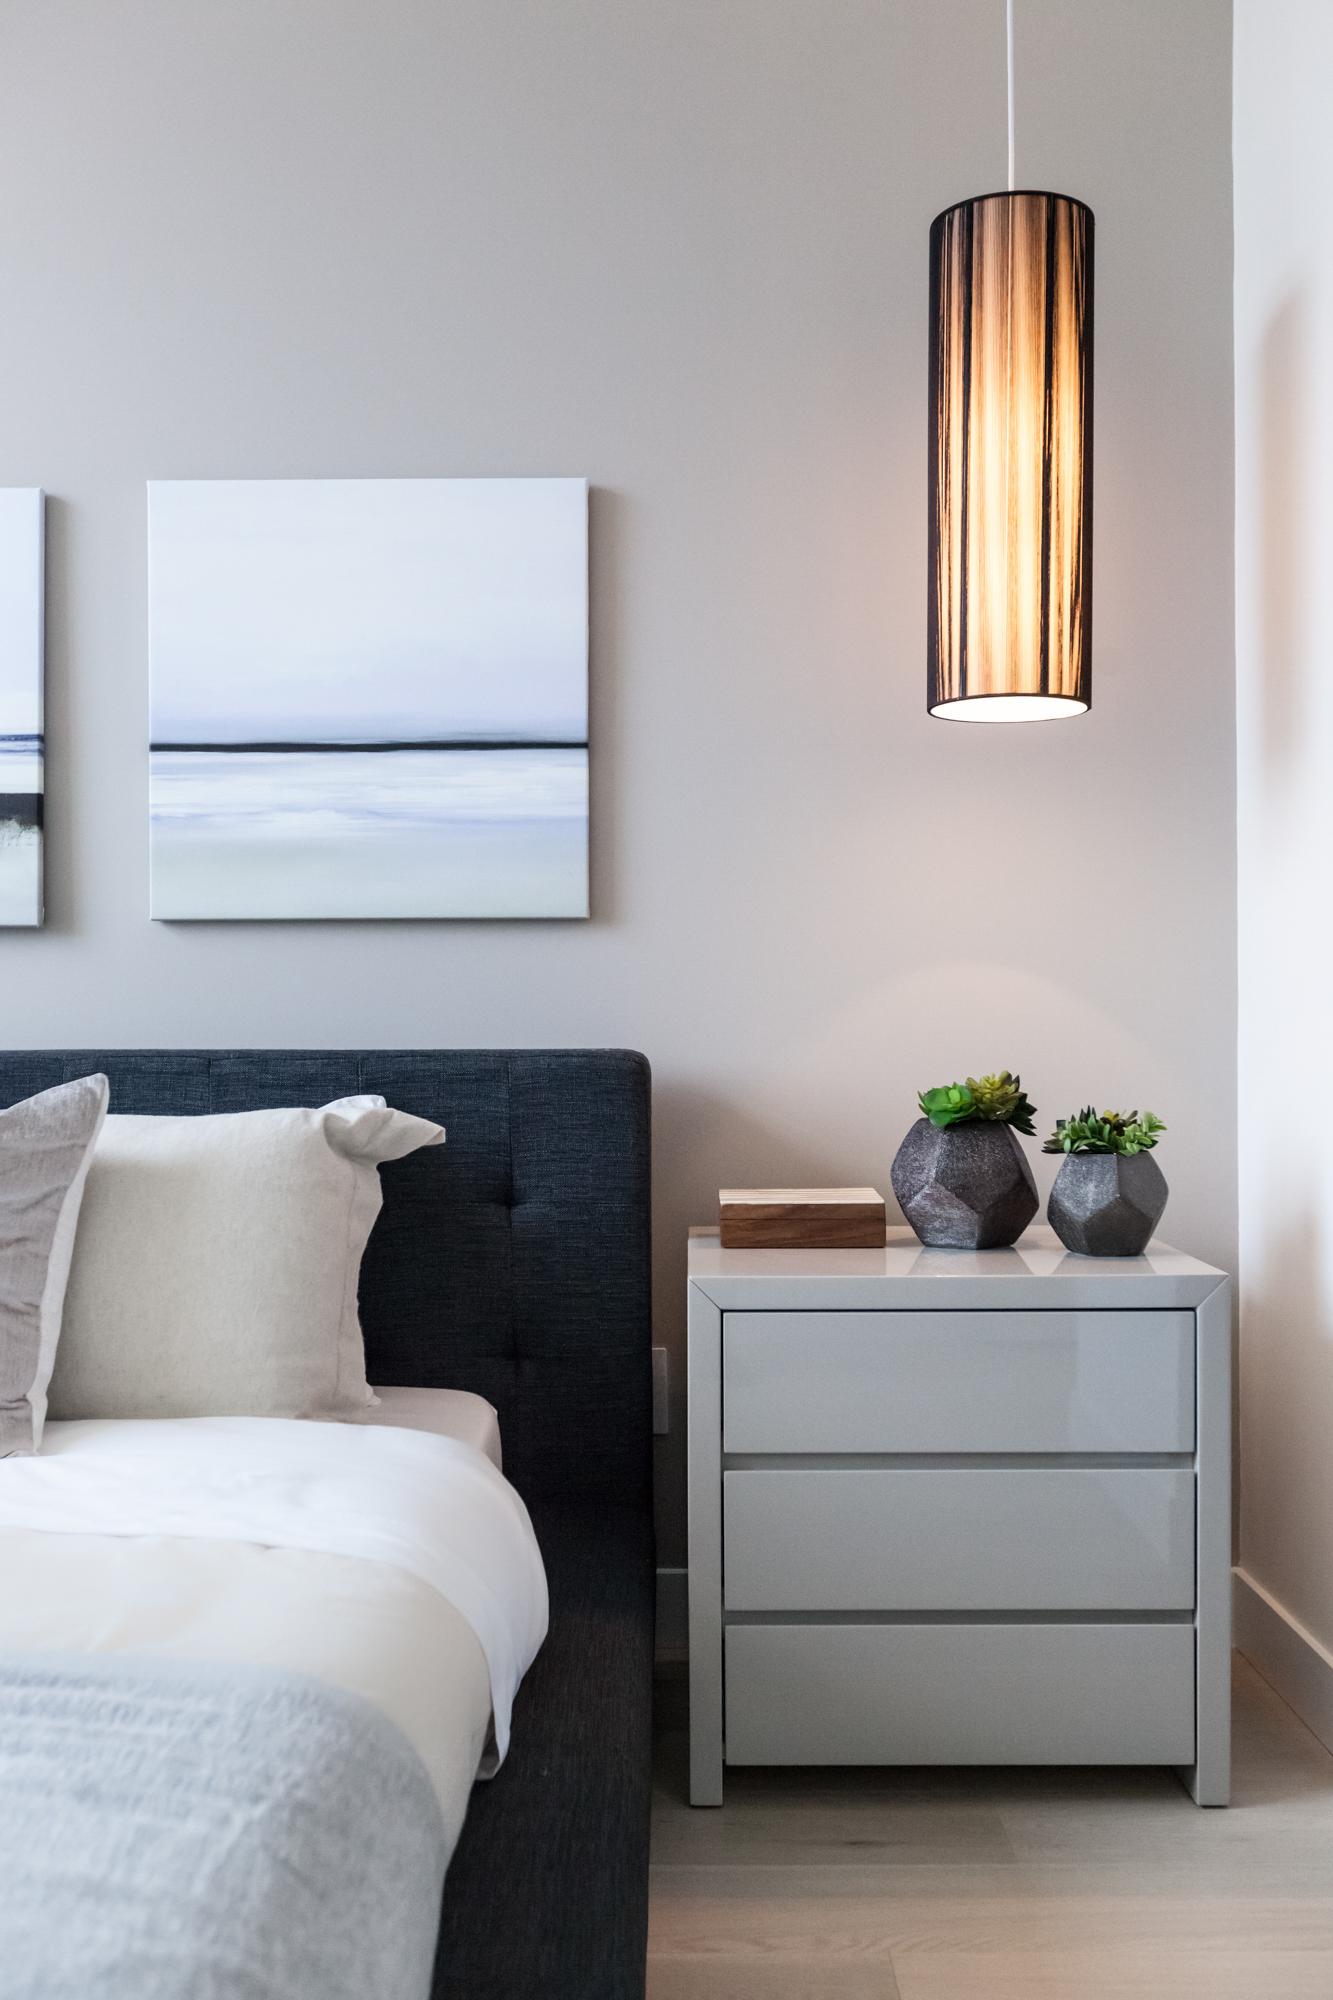 vancouver-interior-design-0012.jpg